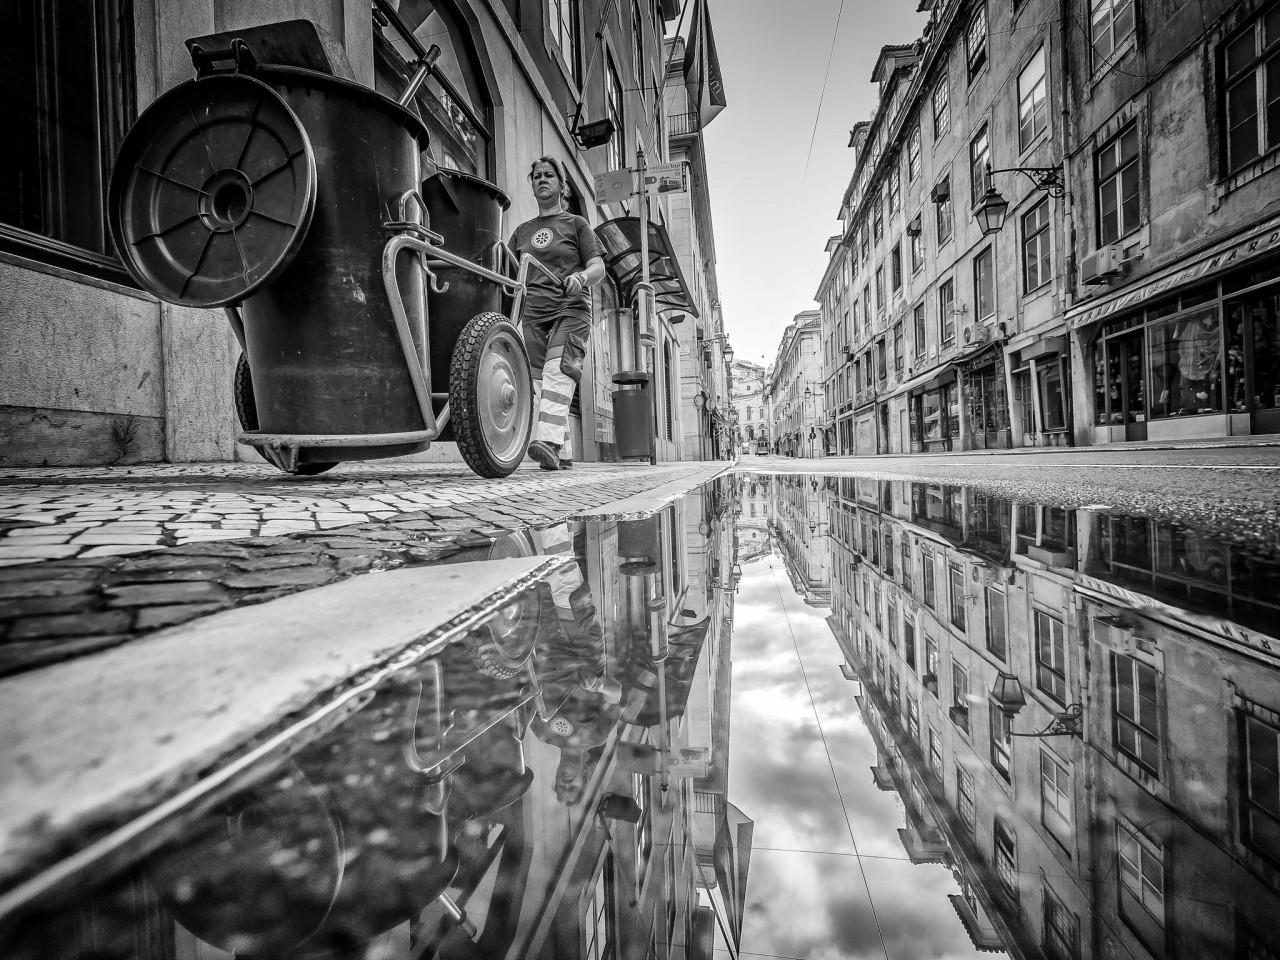 Фотография Untitled автор Daniel Antunes на 500px